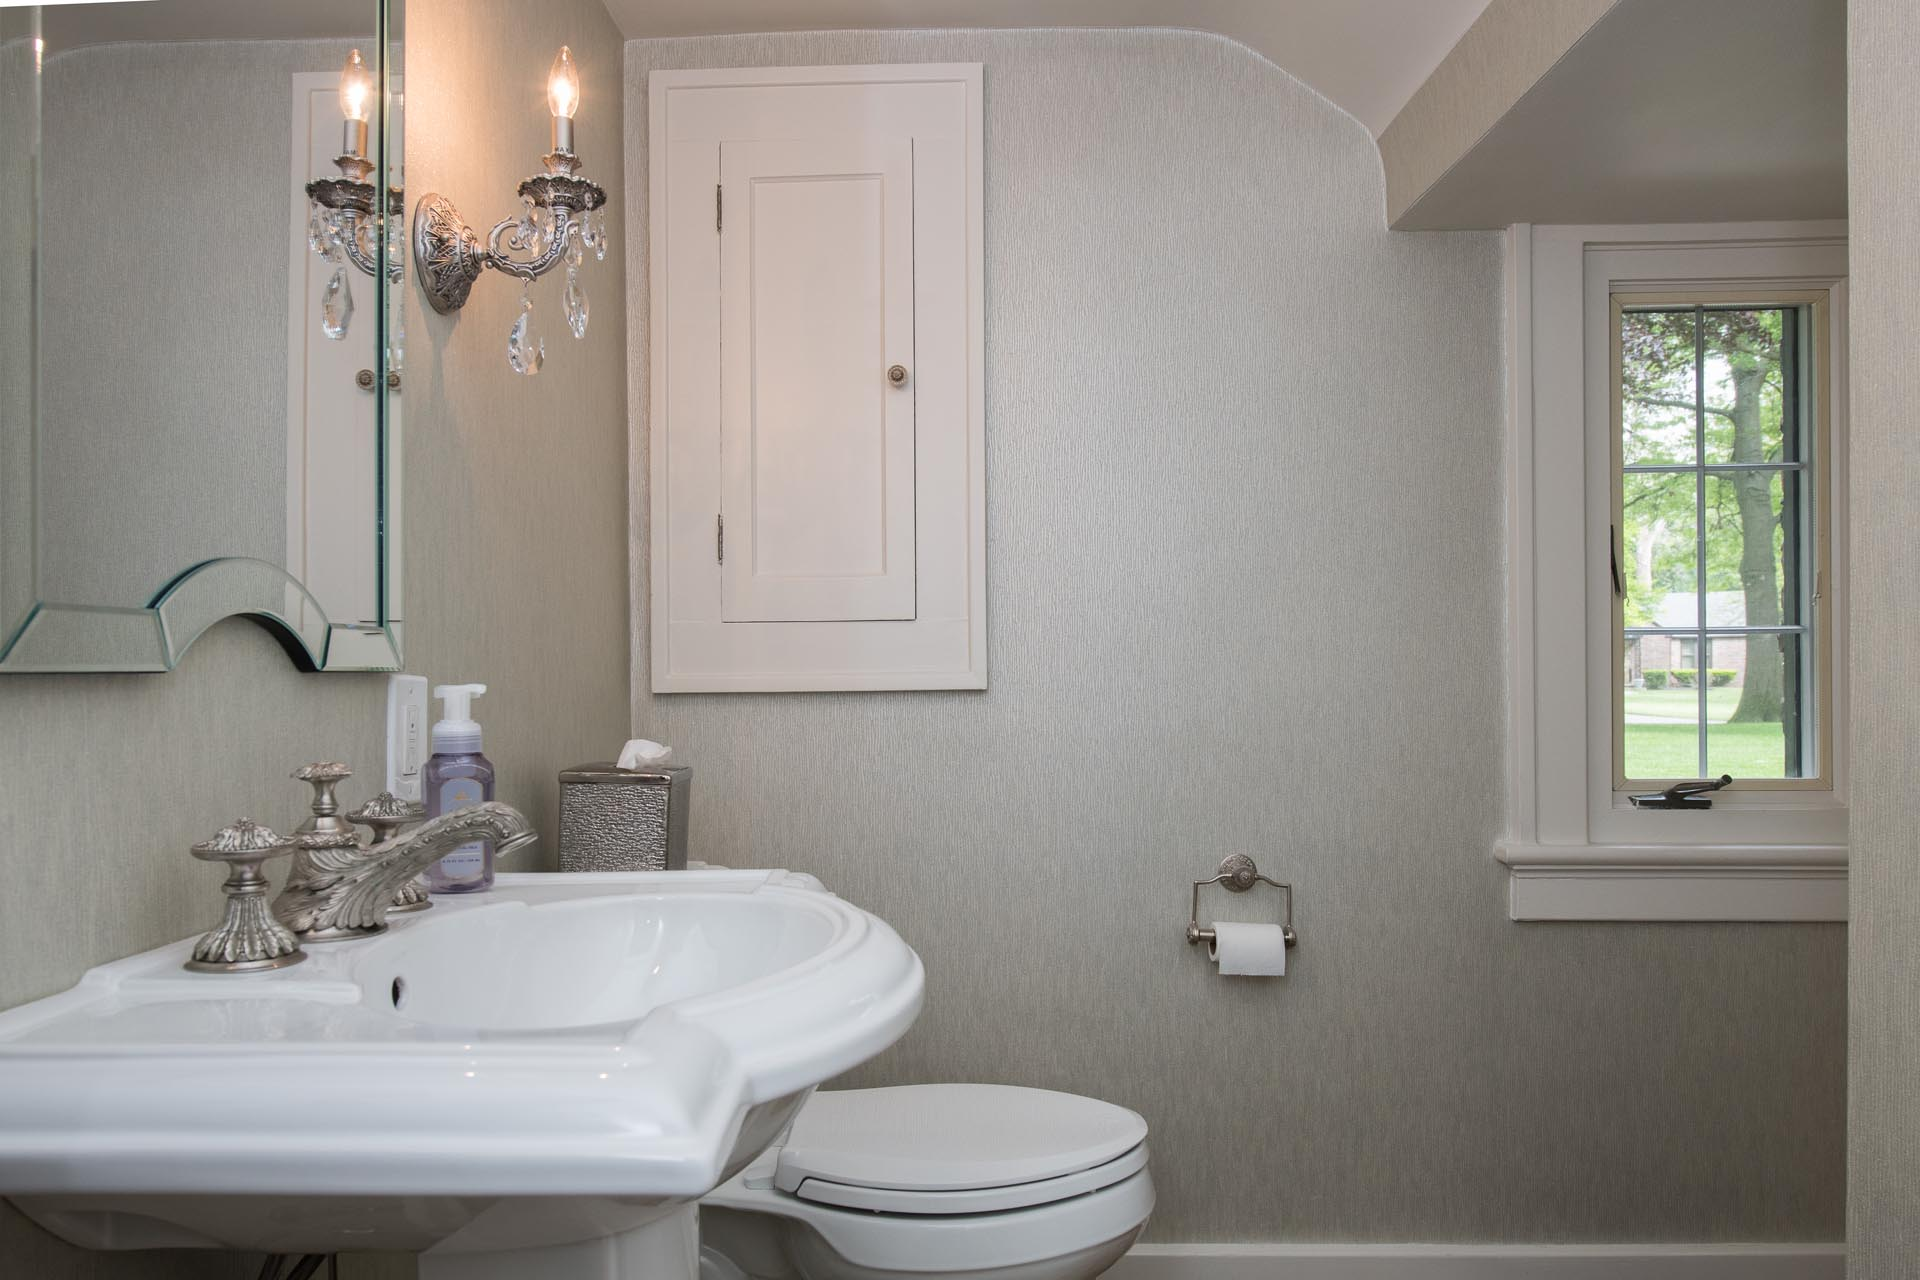 Faucet, Sink, and Toilet | Bathroom Renovation | Saginaw, MI